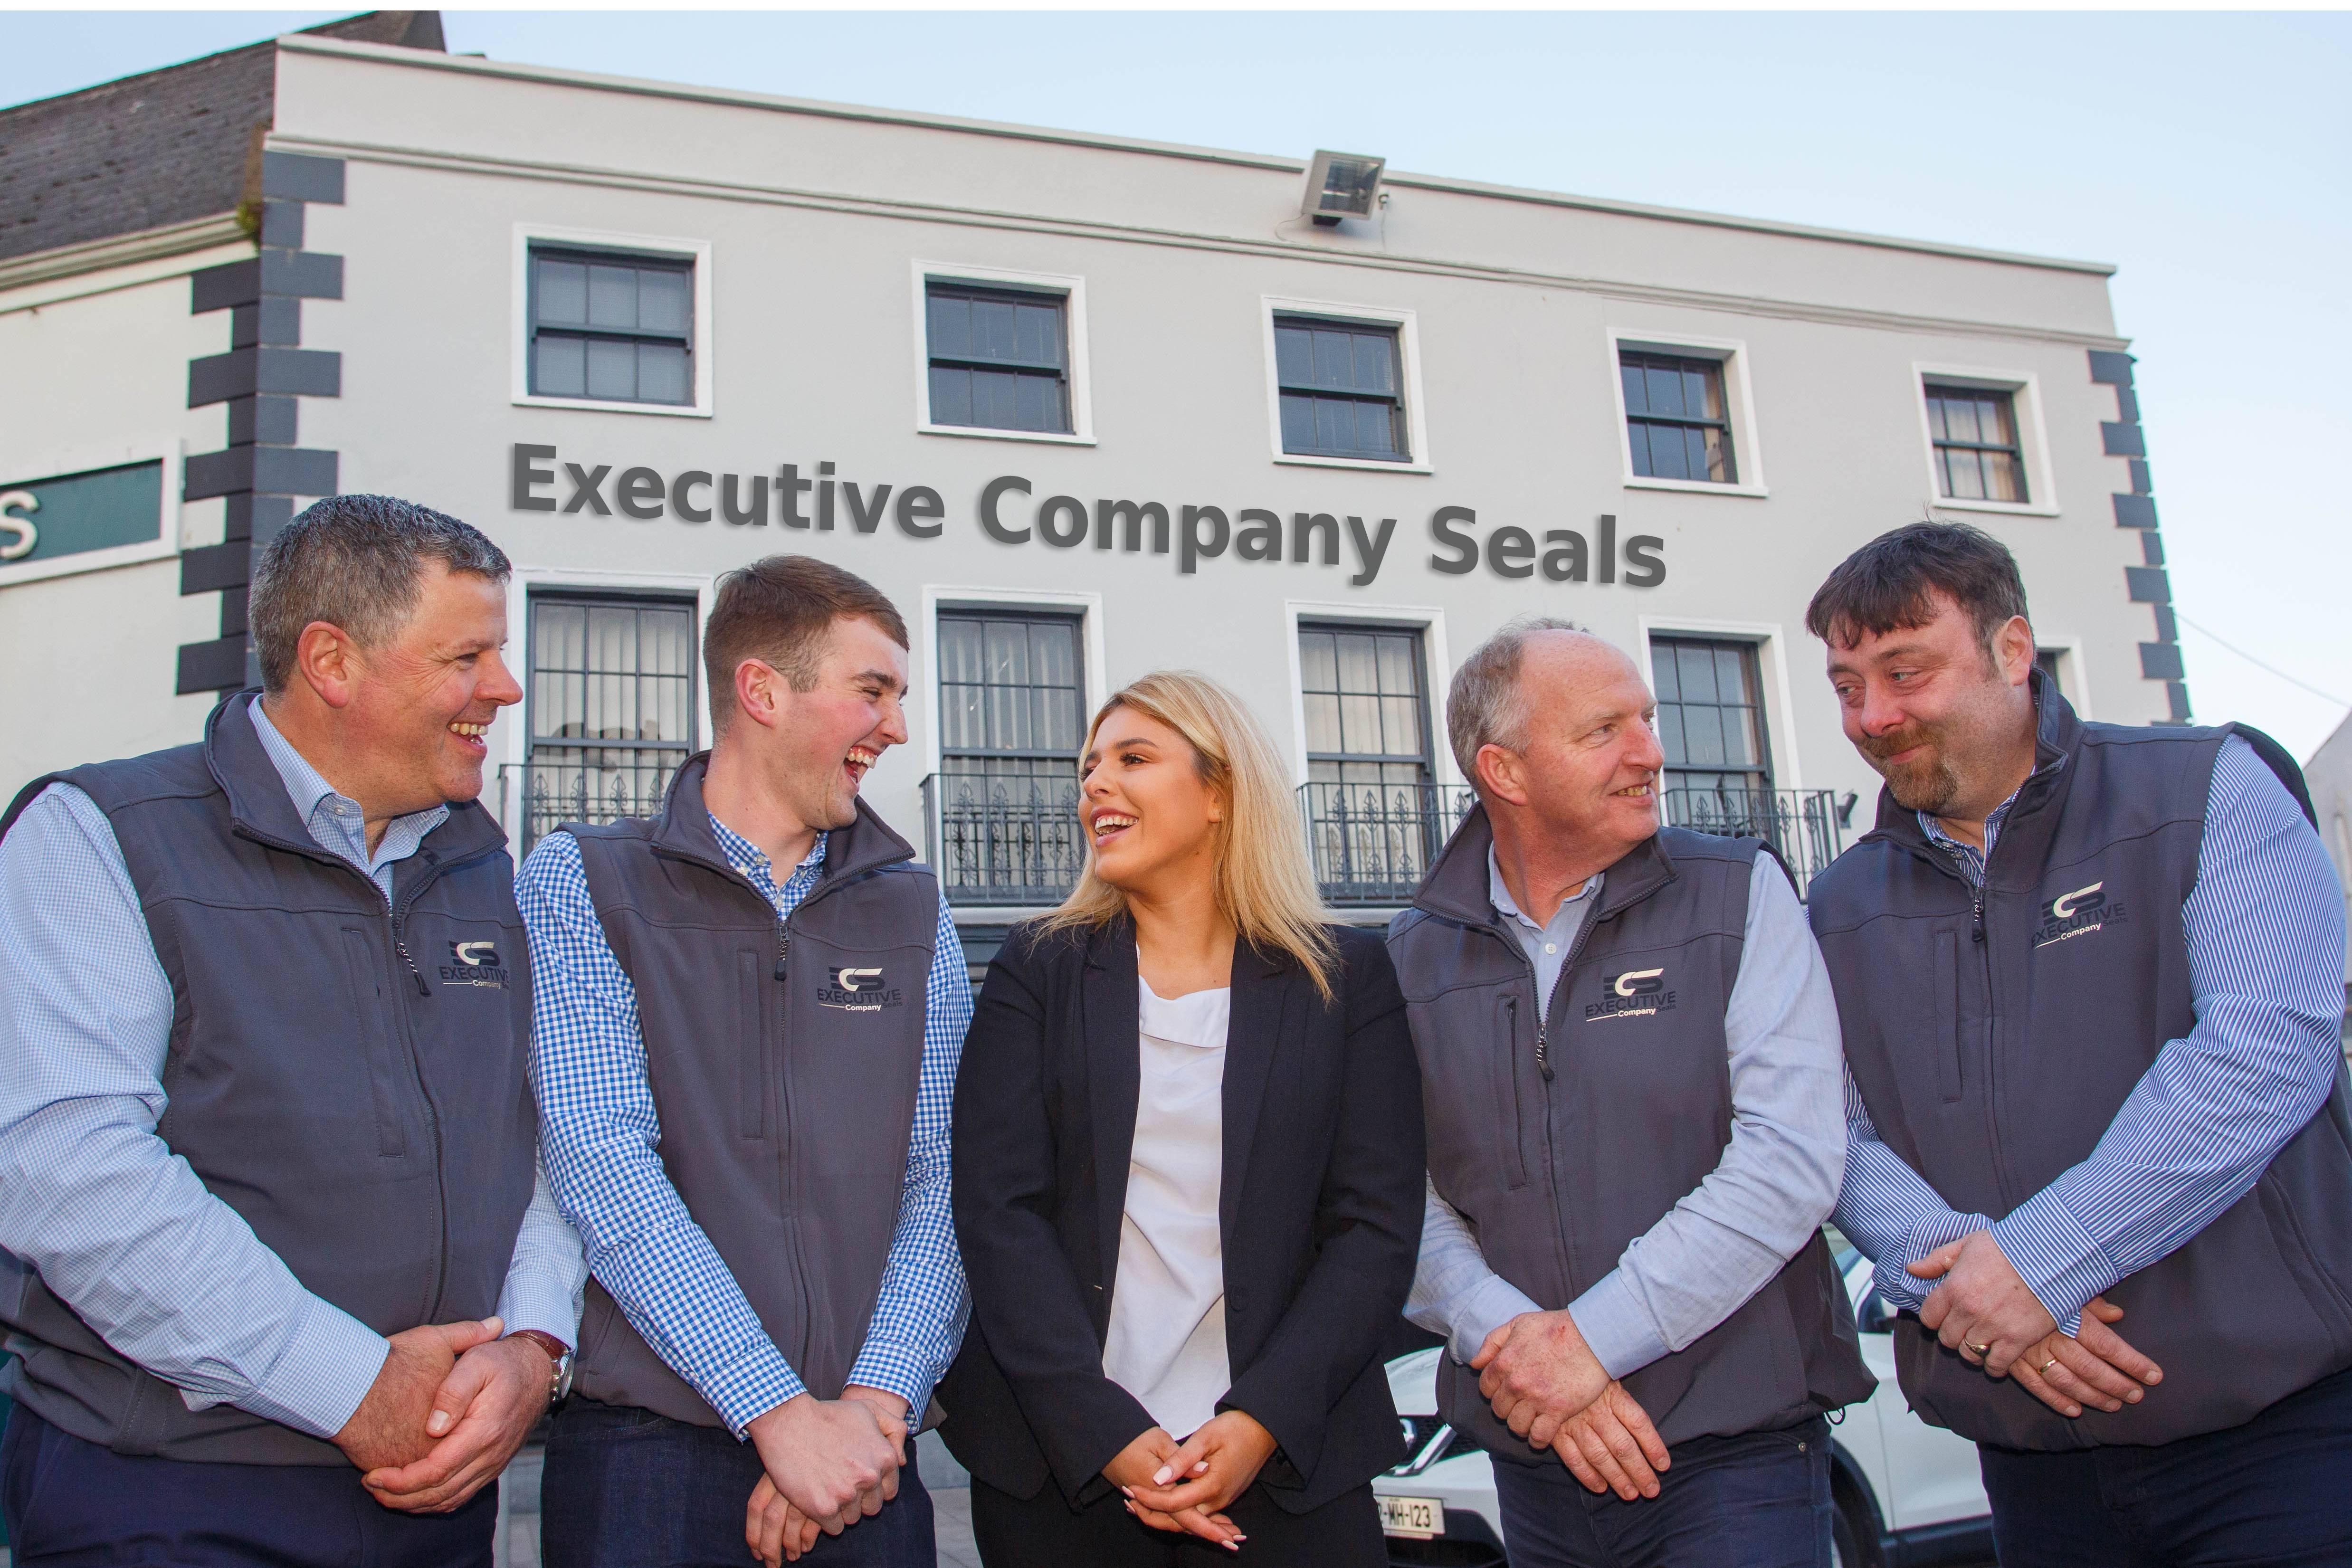 Executive Company Seals Team